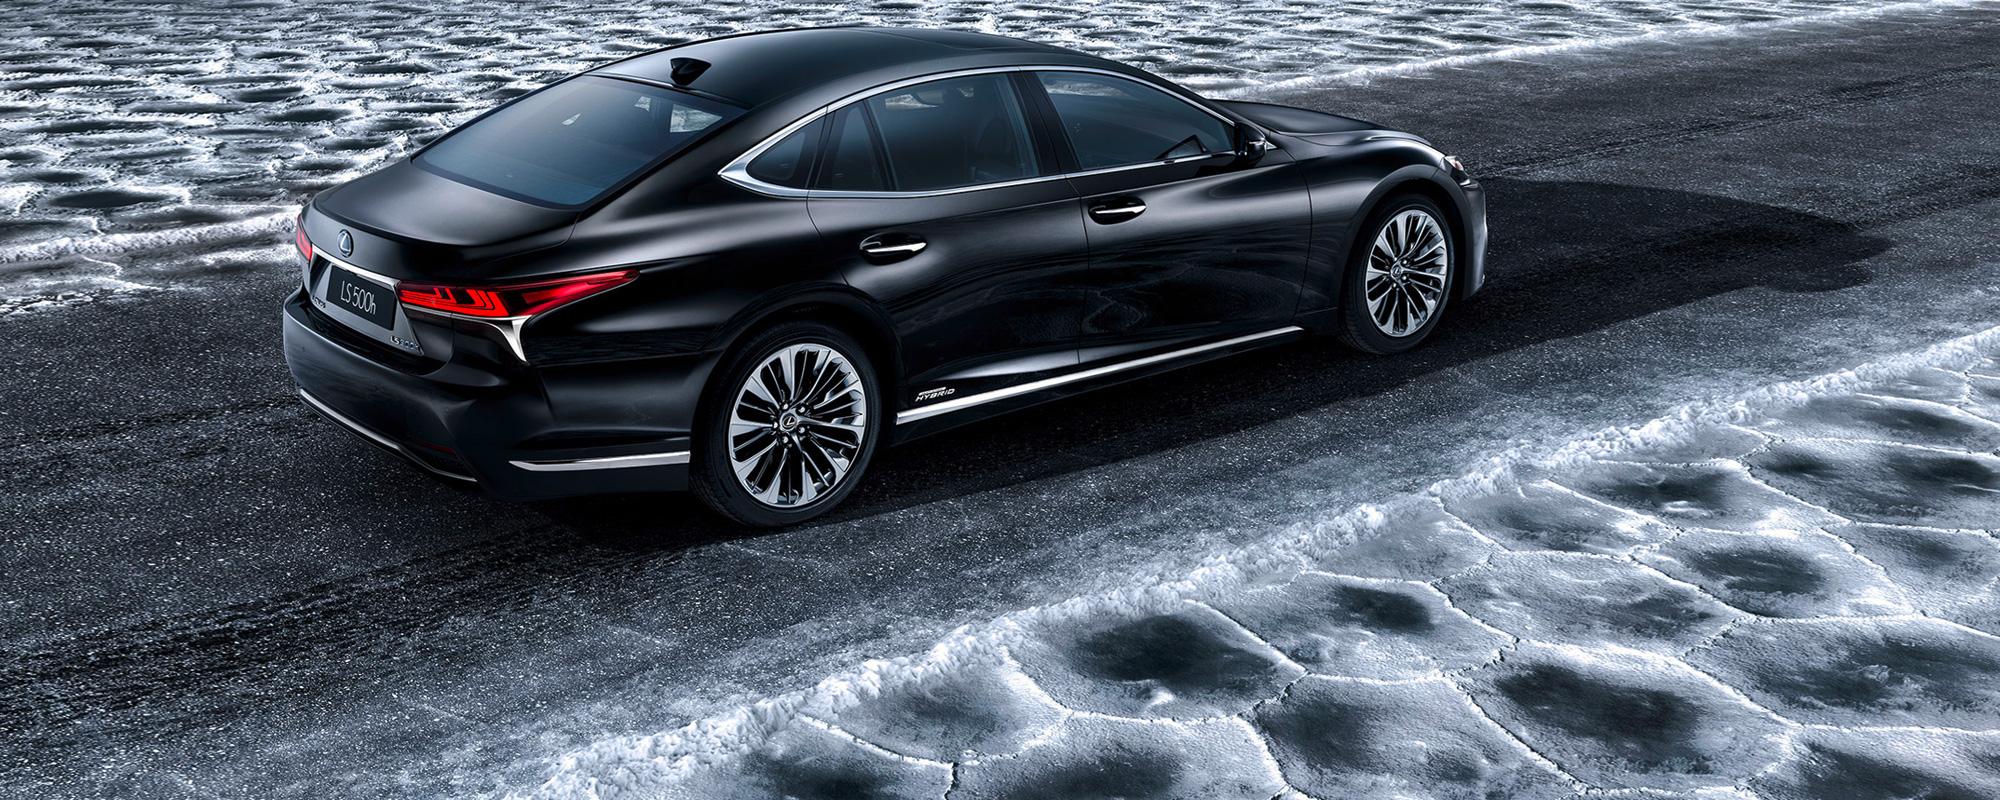 Lexus LS 500[h] luxury limousine wereldprimeur op Autosalon van Genève